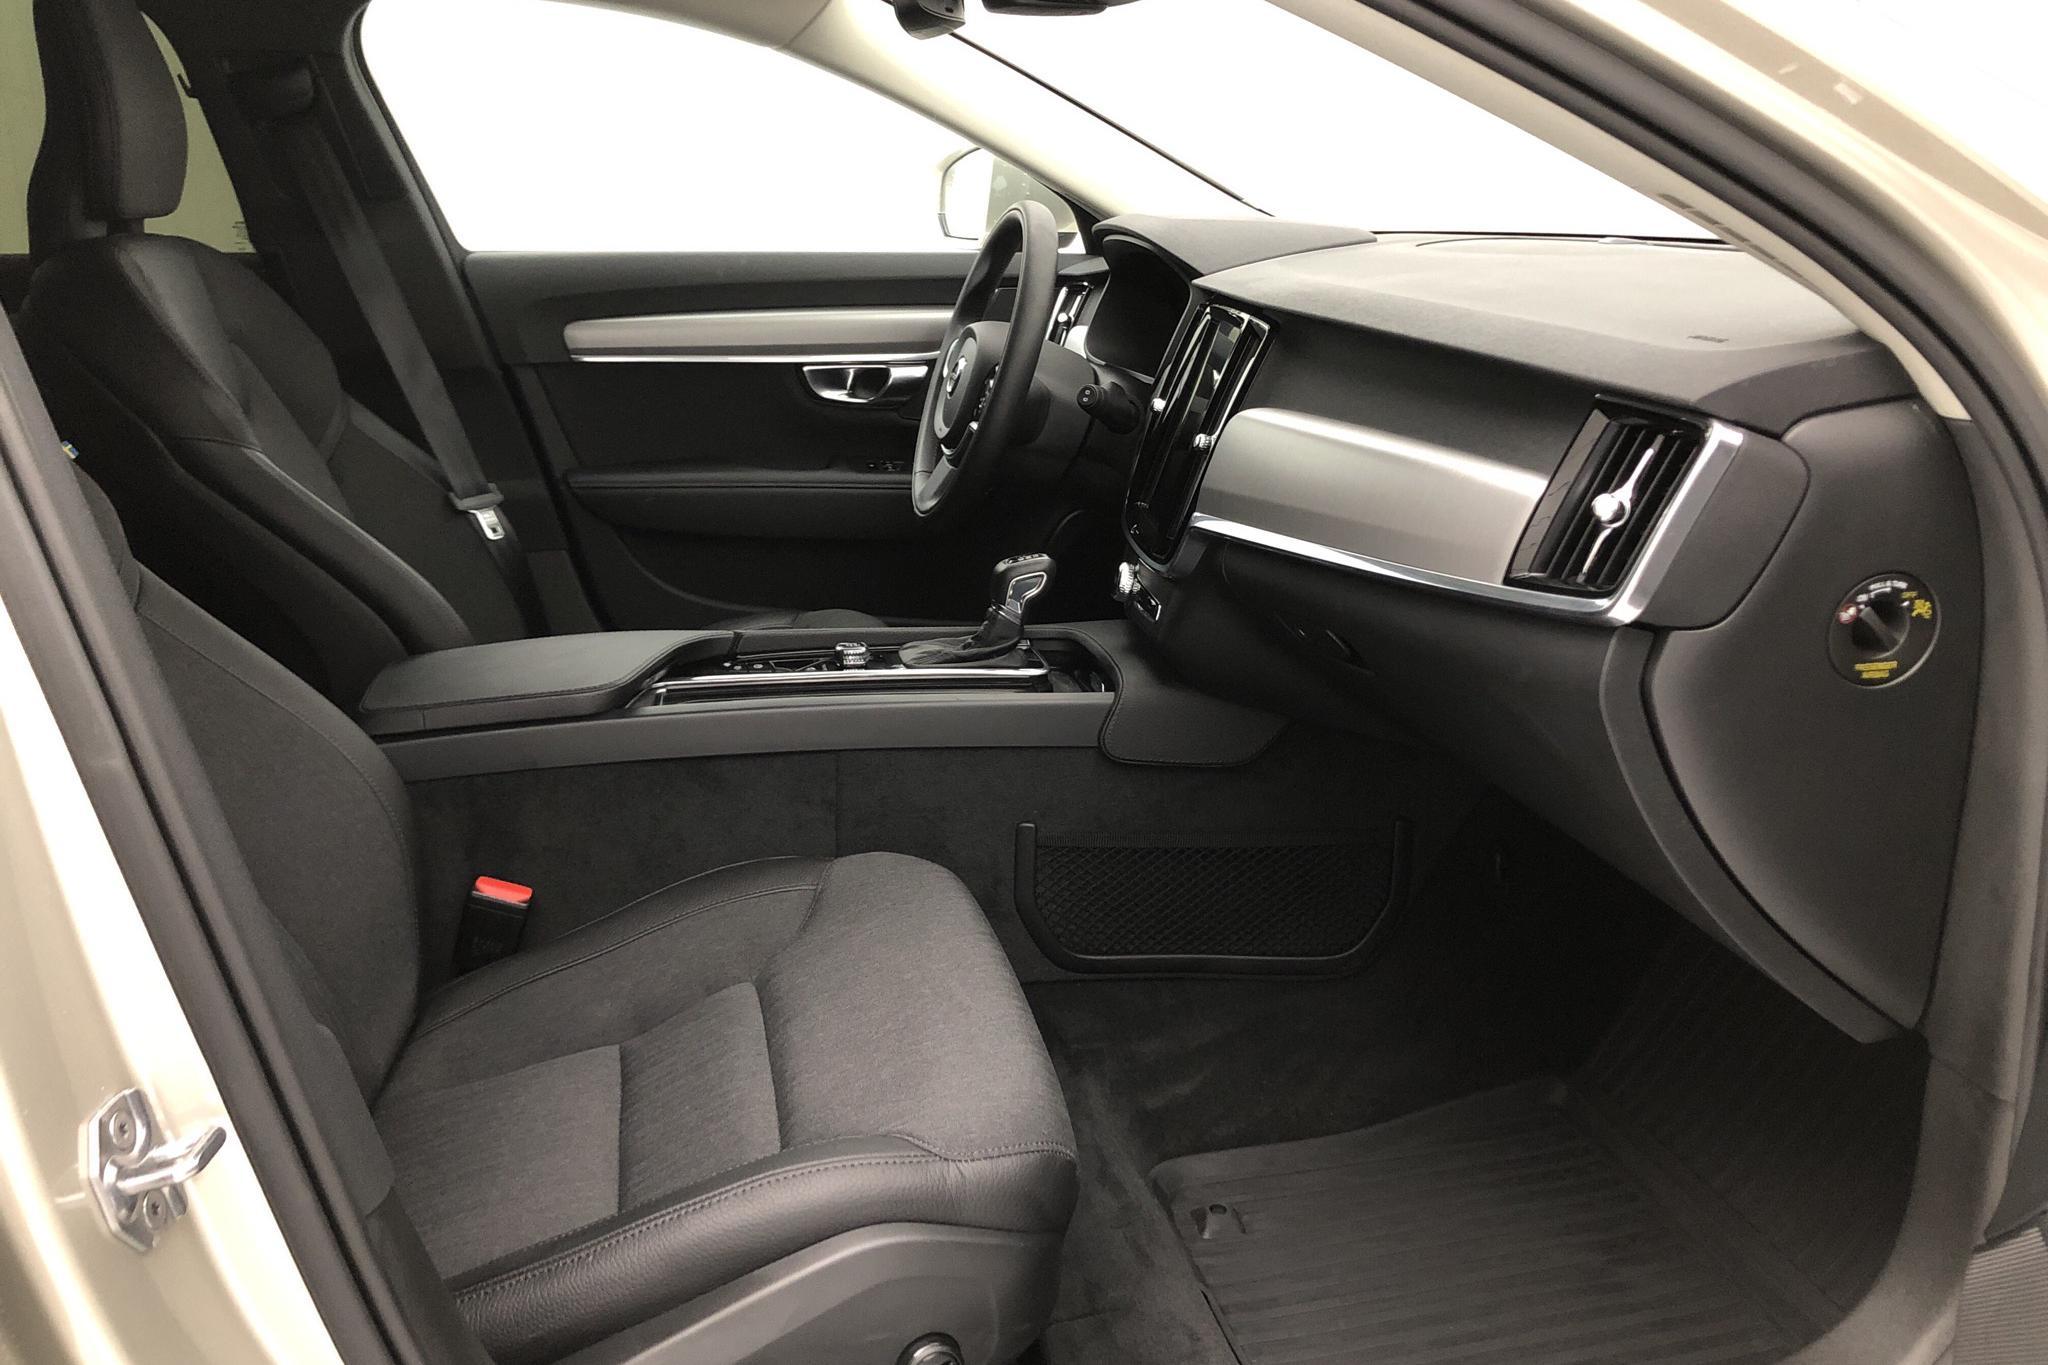 Volvo V90 D4 (190hk) - 10 970 km - Automatic - Light Brown - 2019